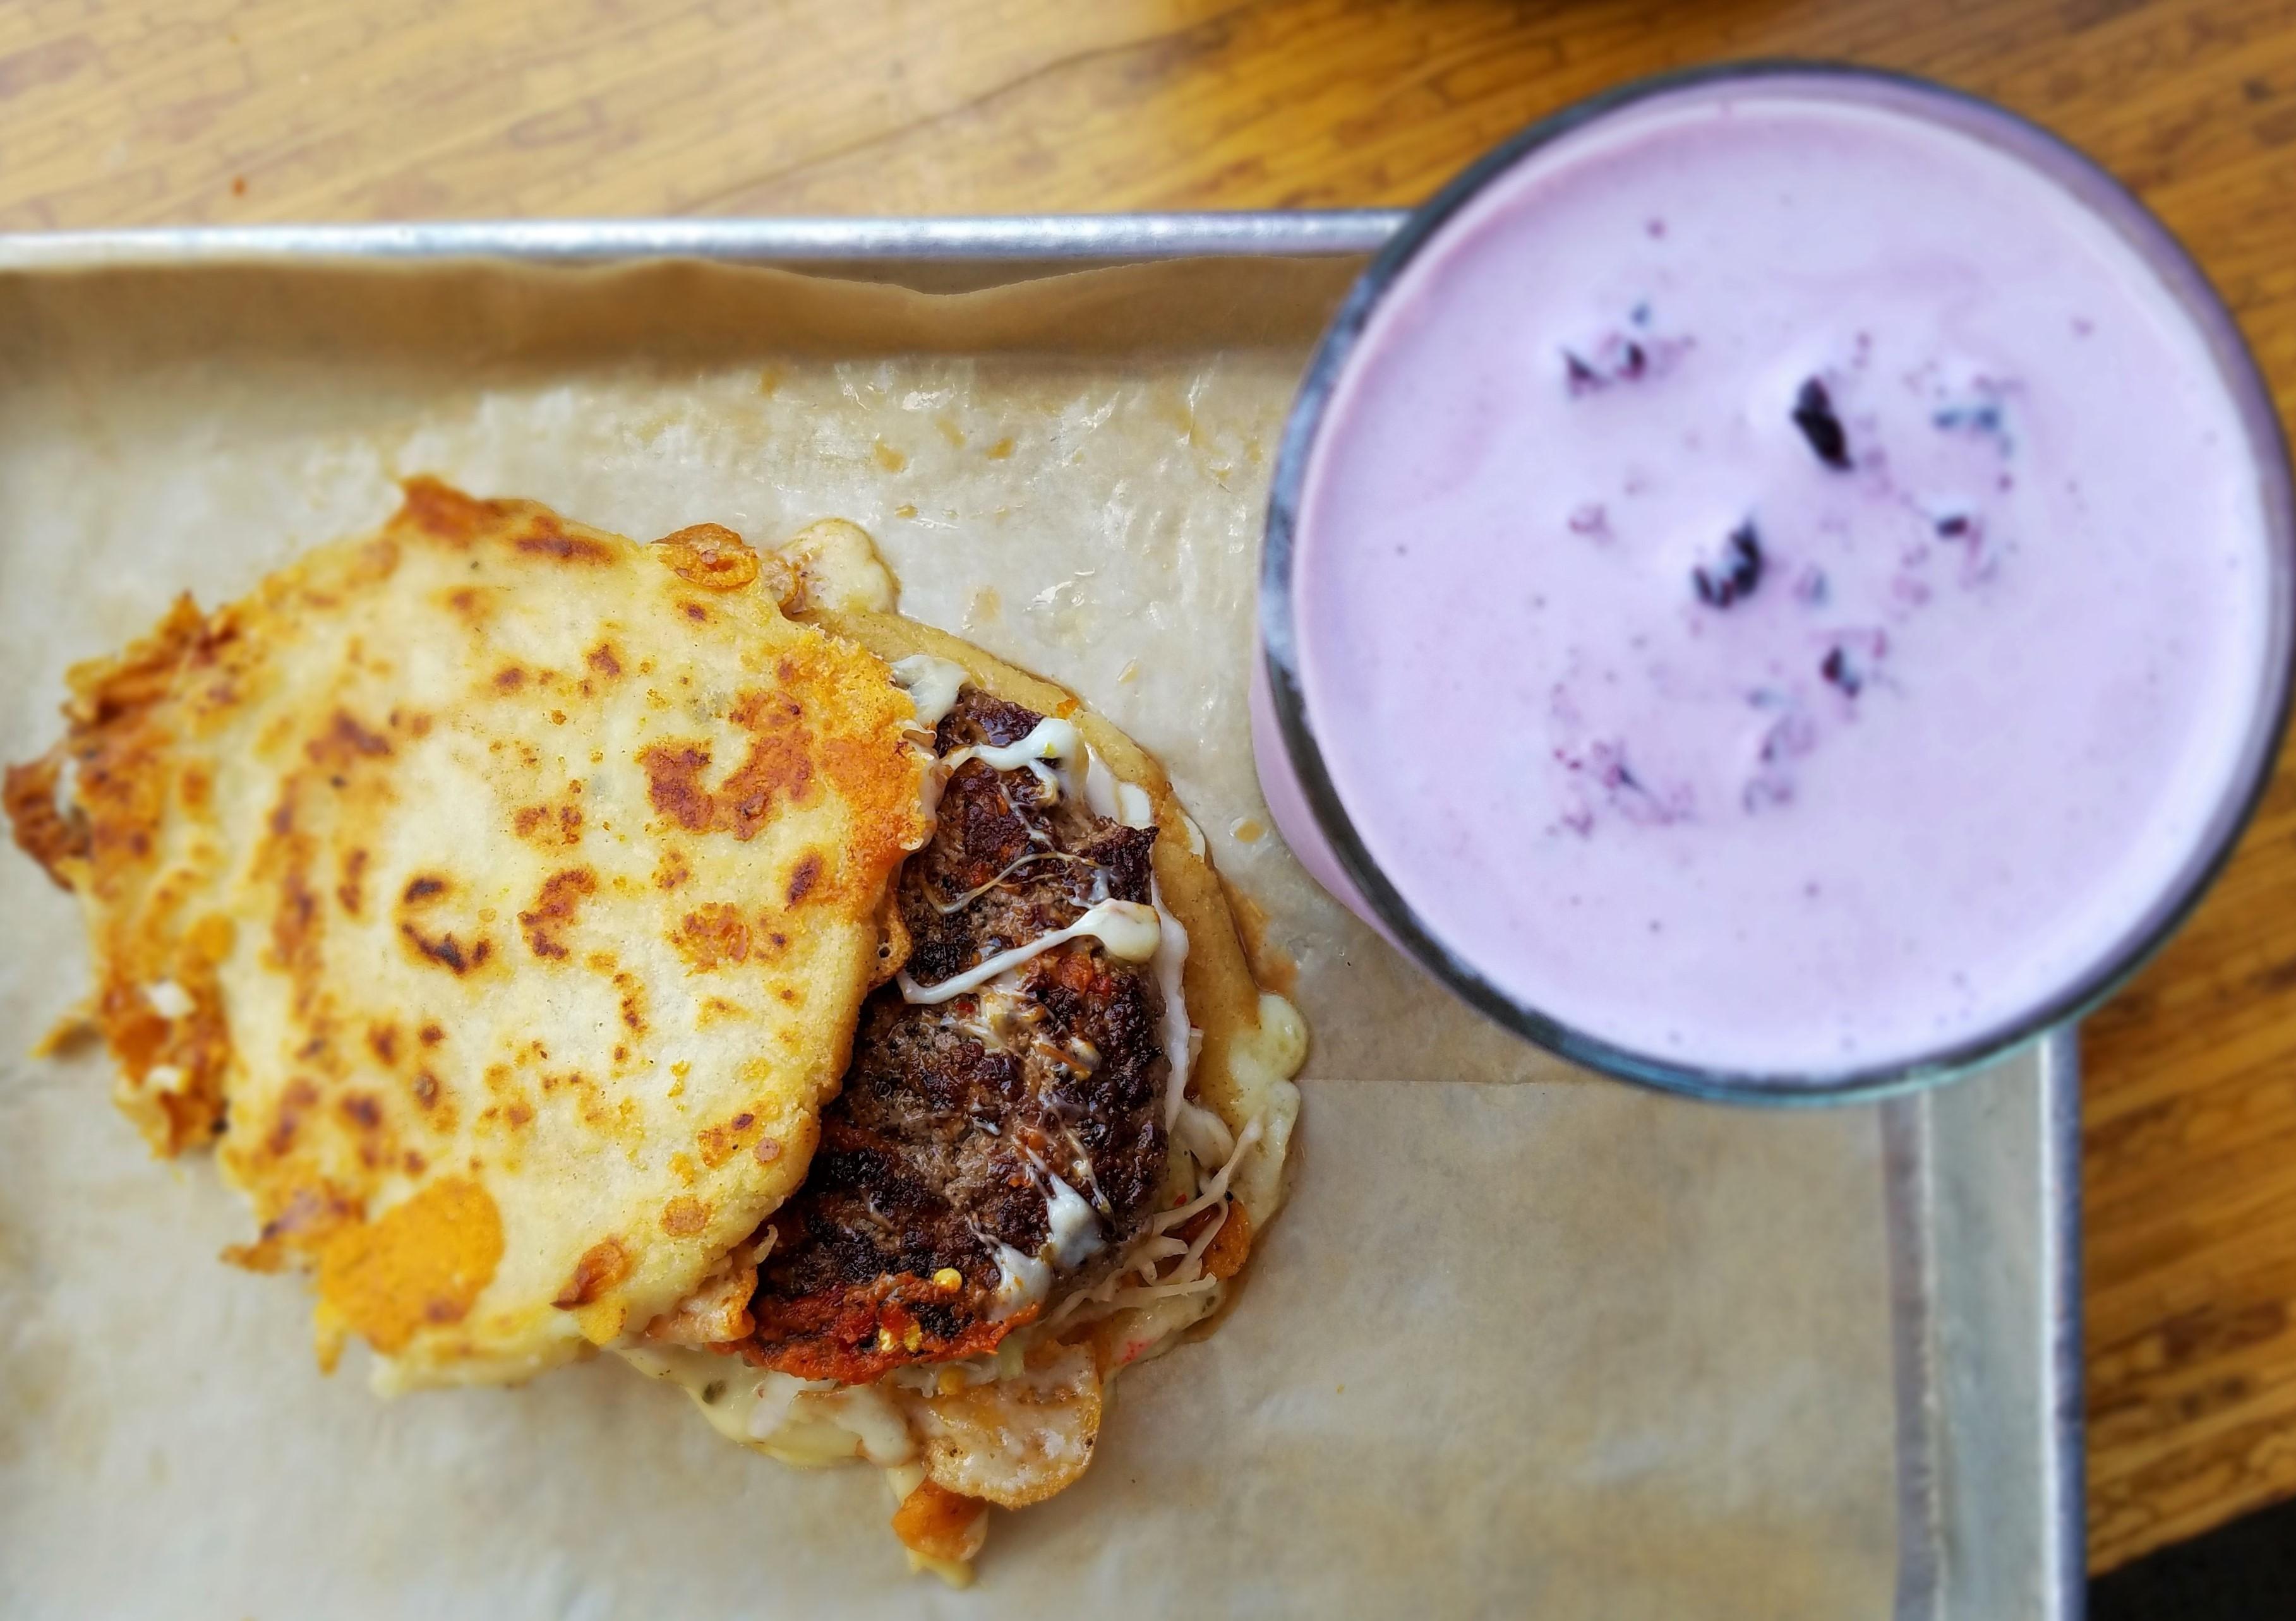 It's a burger... it's a pupusa... it's both, tbh.